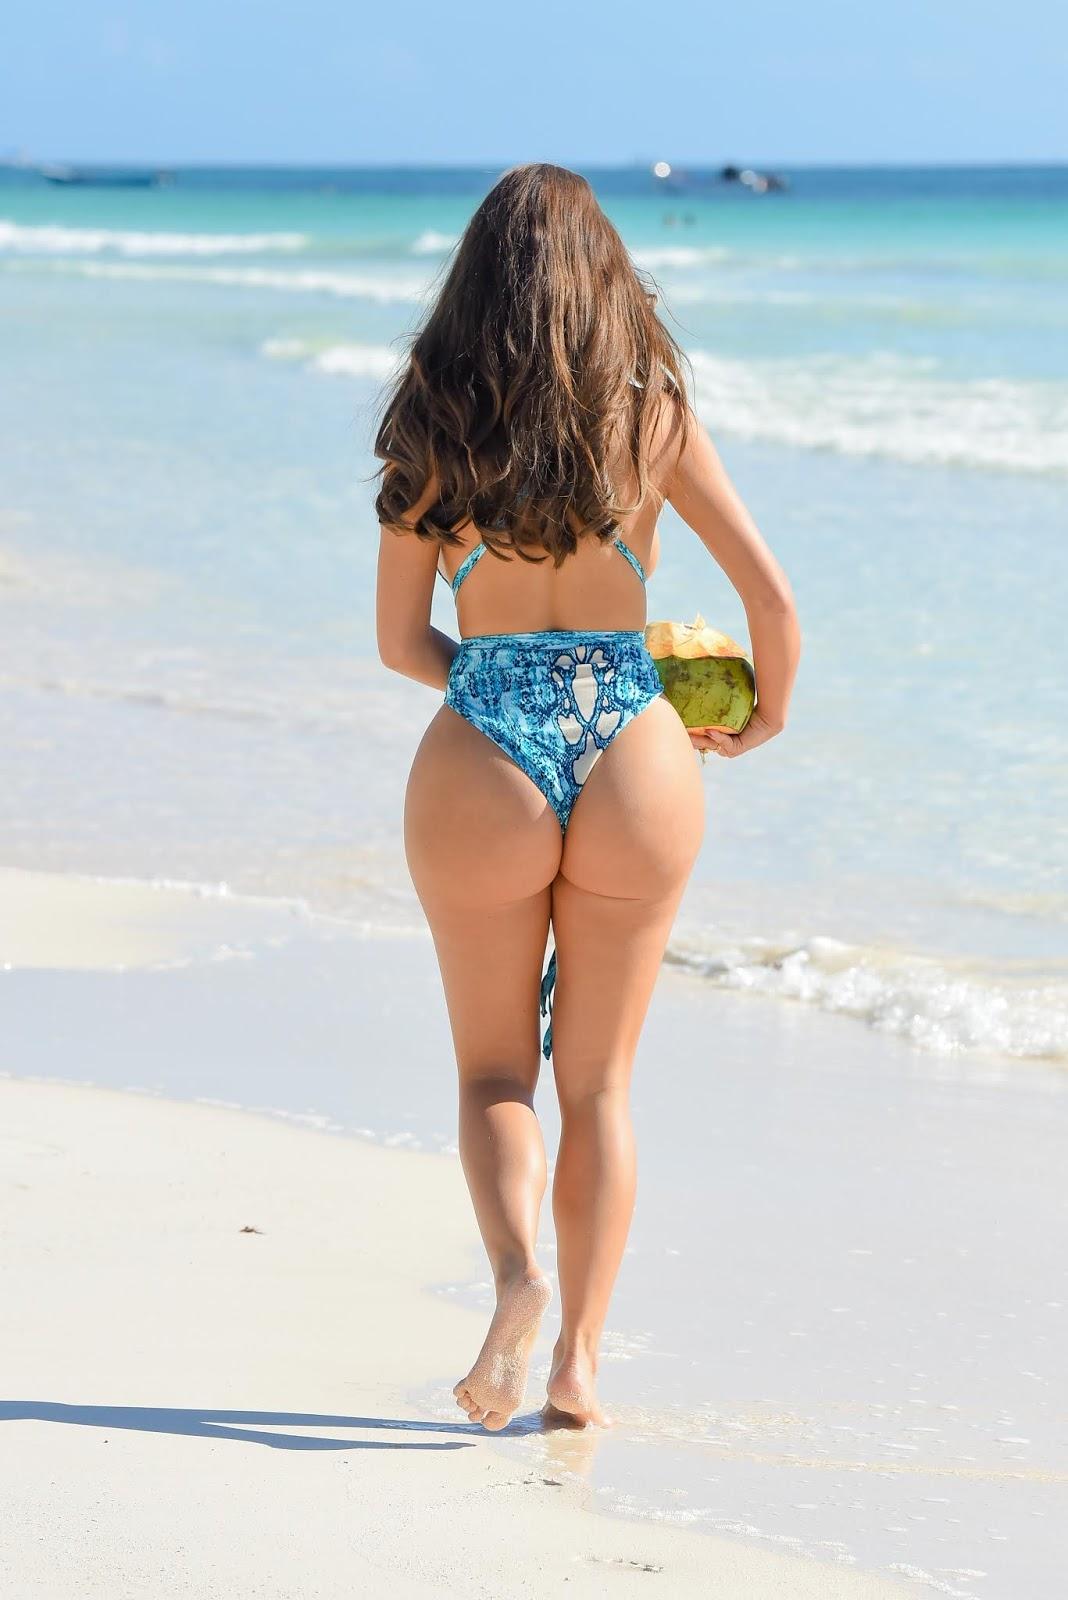 Demi Rose - Swimsuit photo shoot in Tulum Mexico